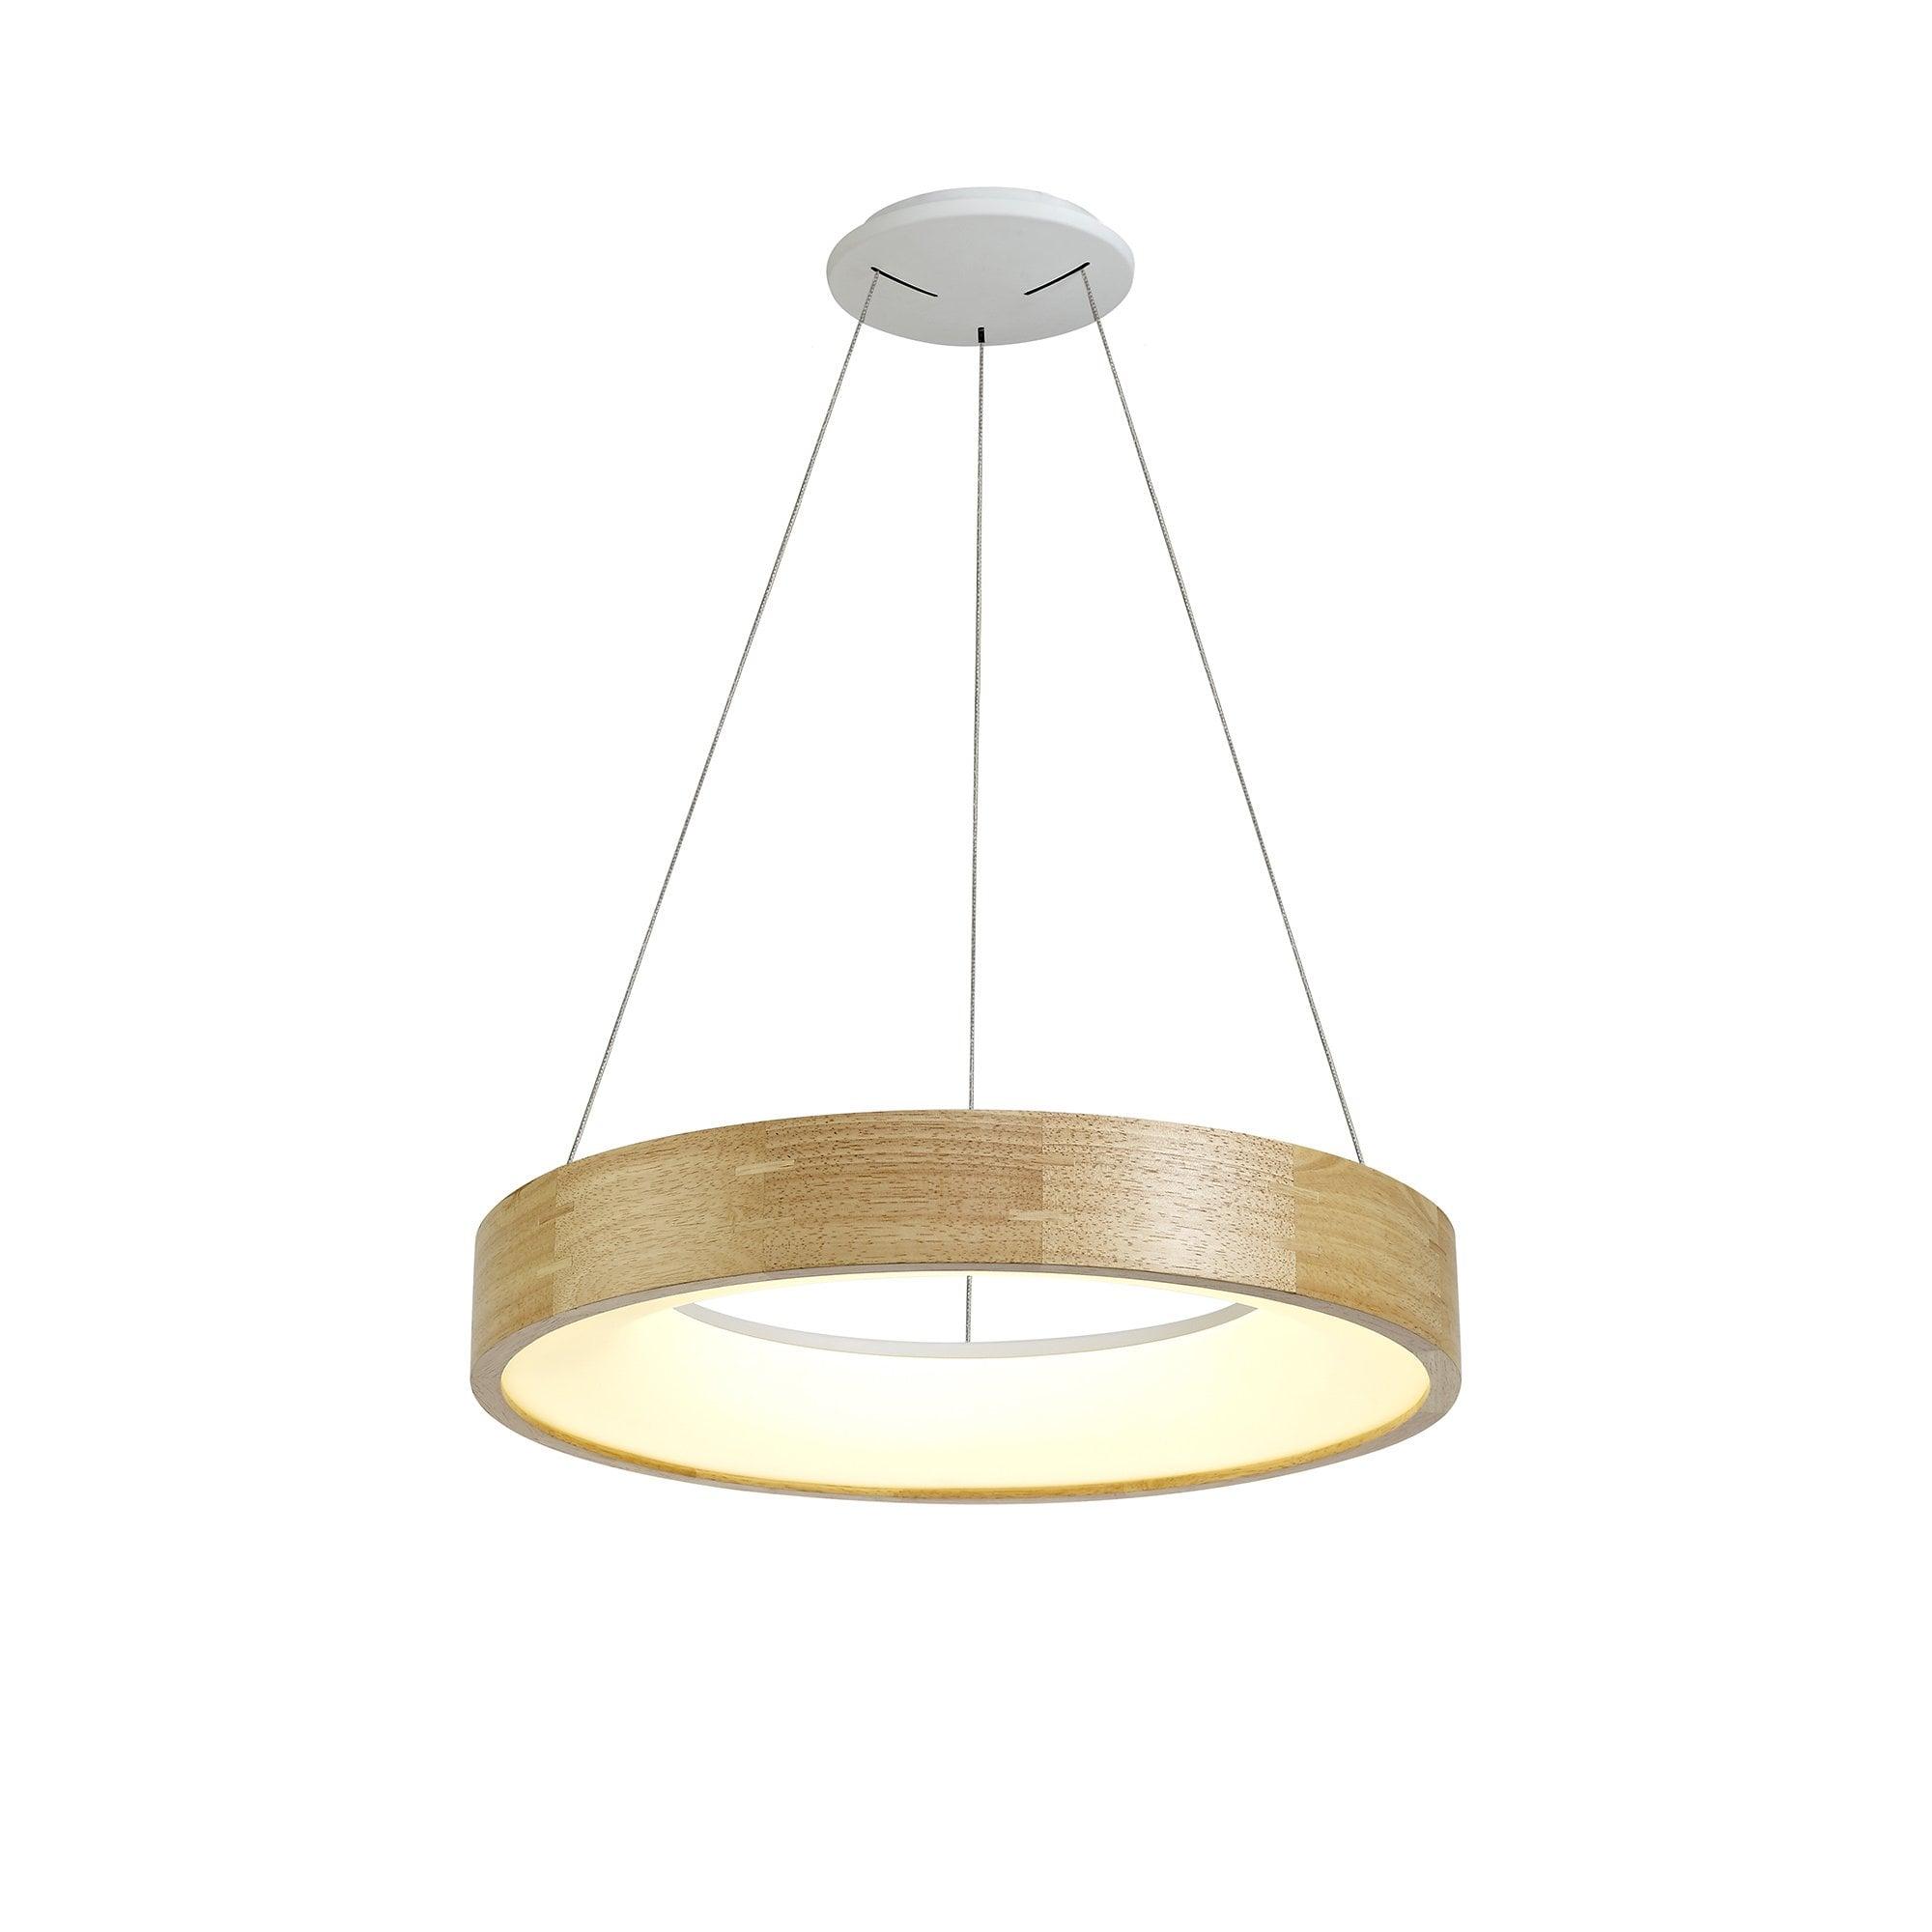 Modern Wood Ceiling Light Wood Effect Lighting Lighting Company Uk